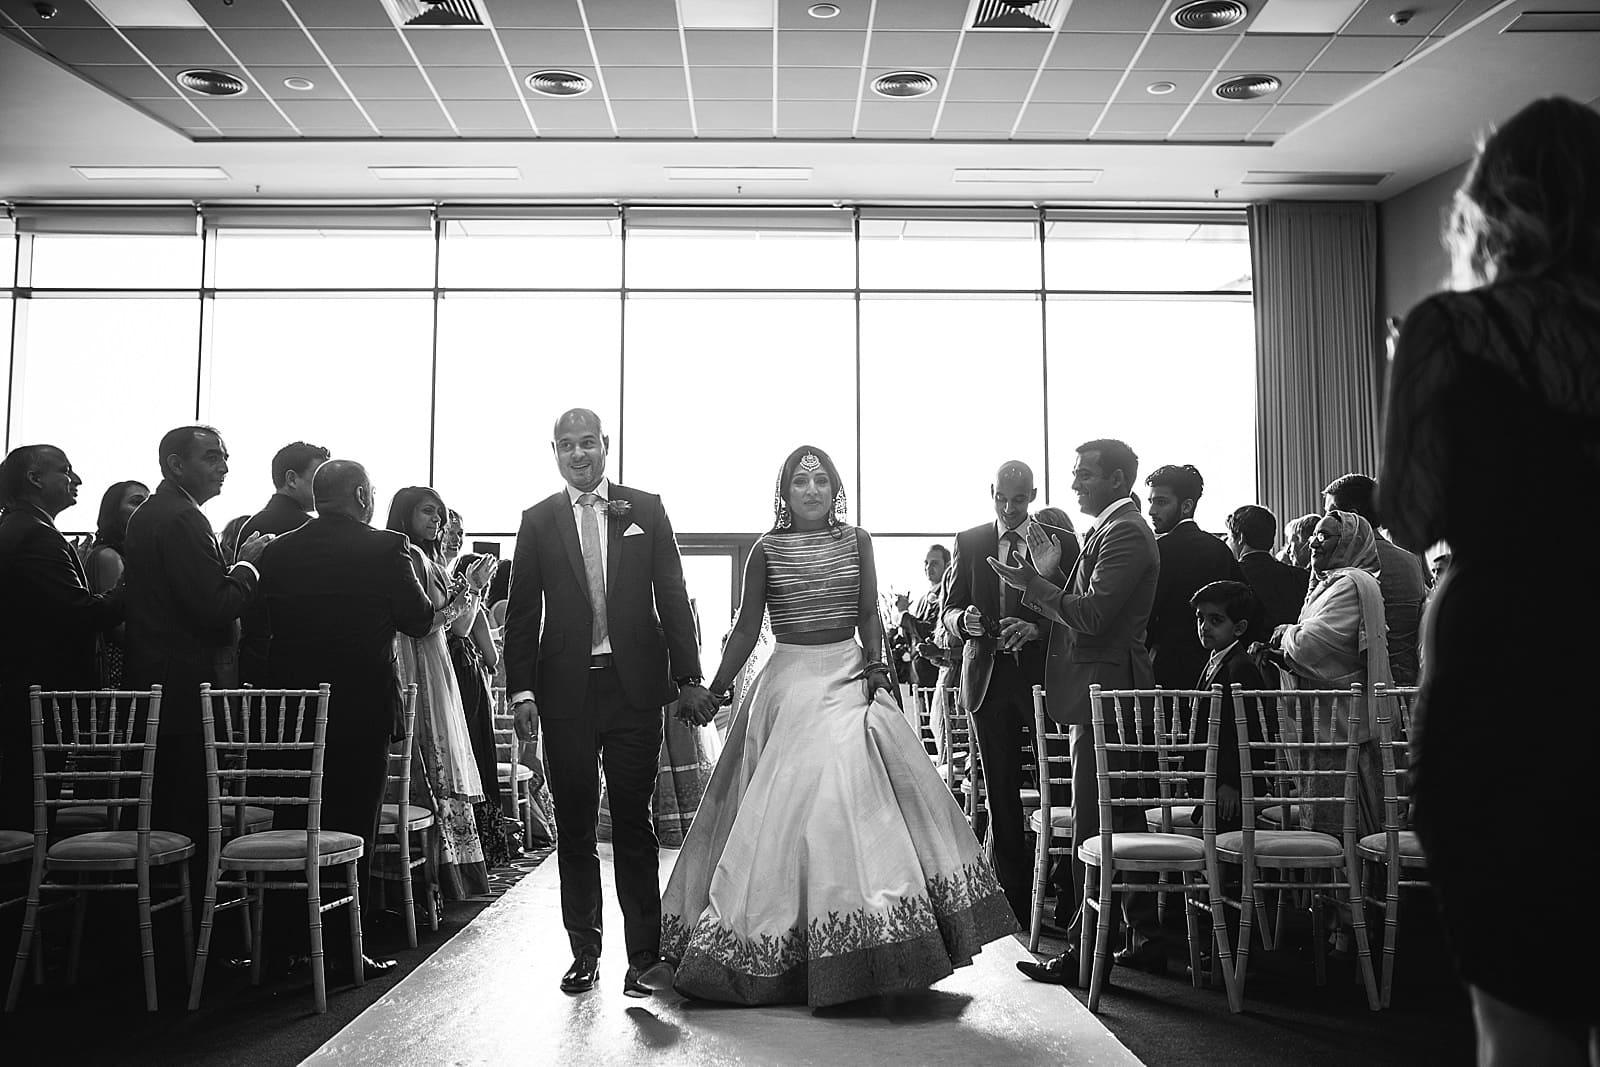 sikh-wedding-photography-birmingham-edgbaston_0144